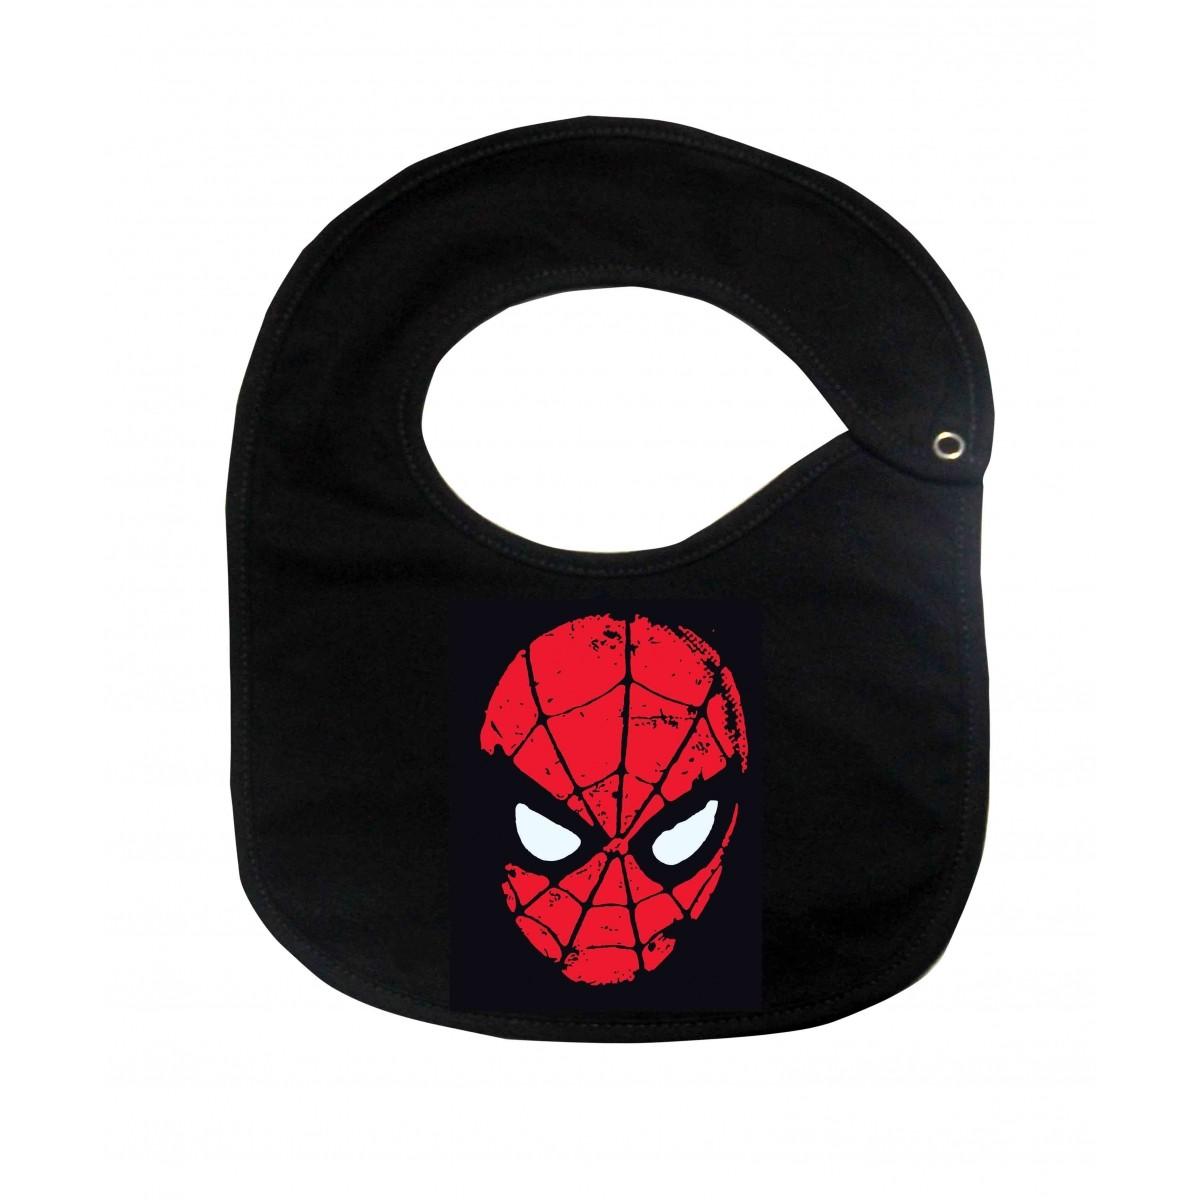 Babador Super Heróis Baby  - Homem Aranha  - Black  - Baby Monster - Body Bebe